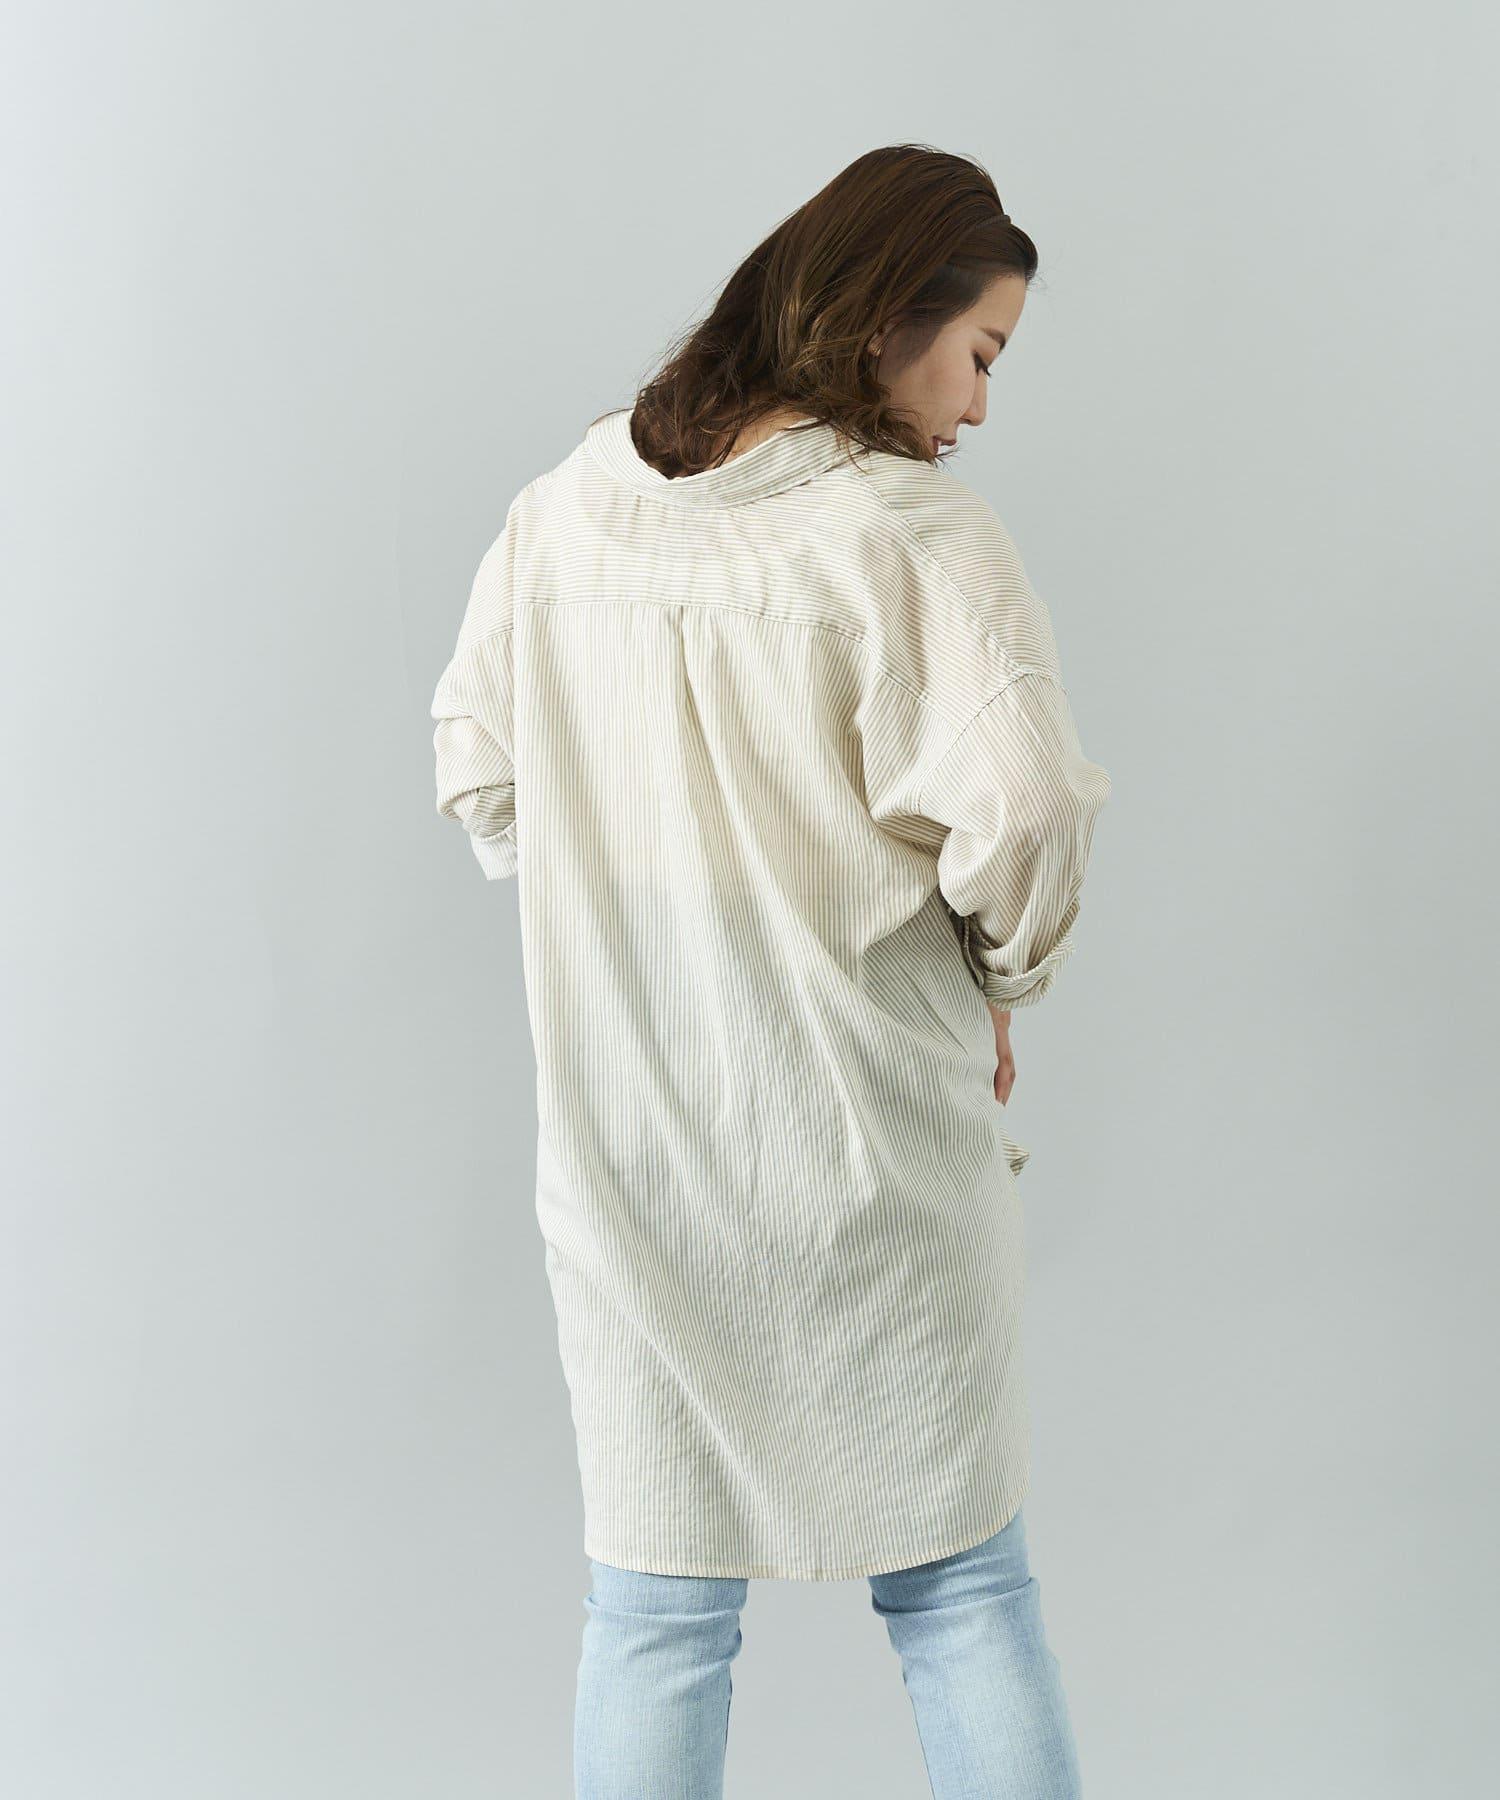 Jena espace merveilleux(ジェナ エスパスメルヴェイユ) コットンガーゼビッグシャツ